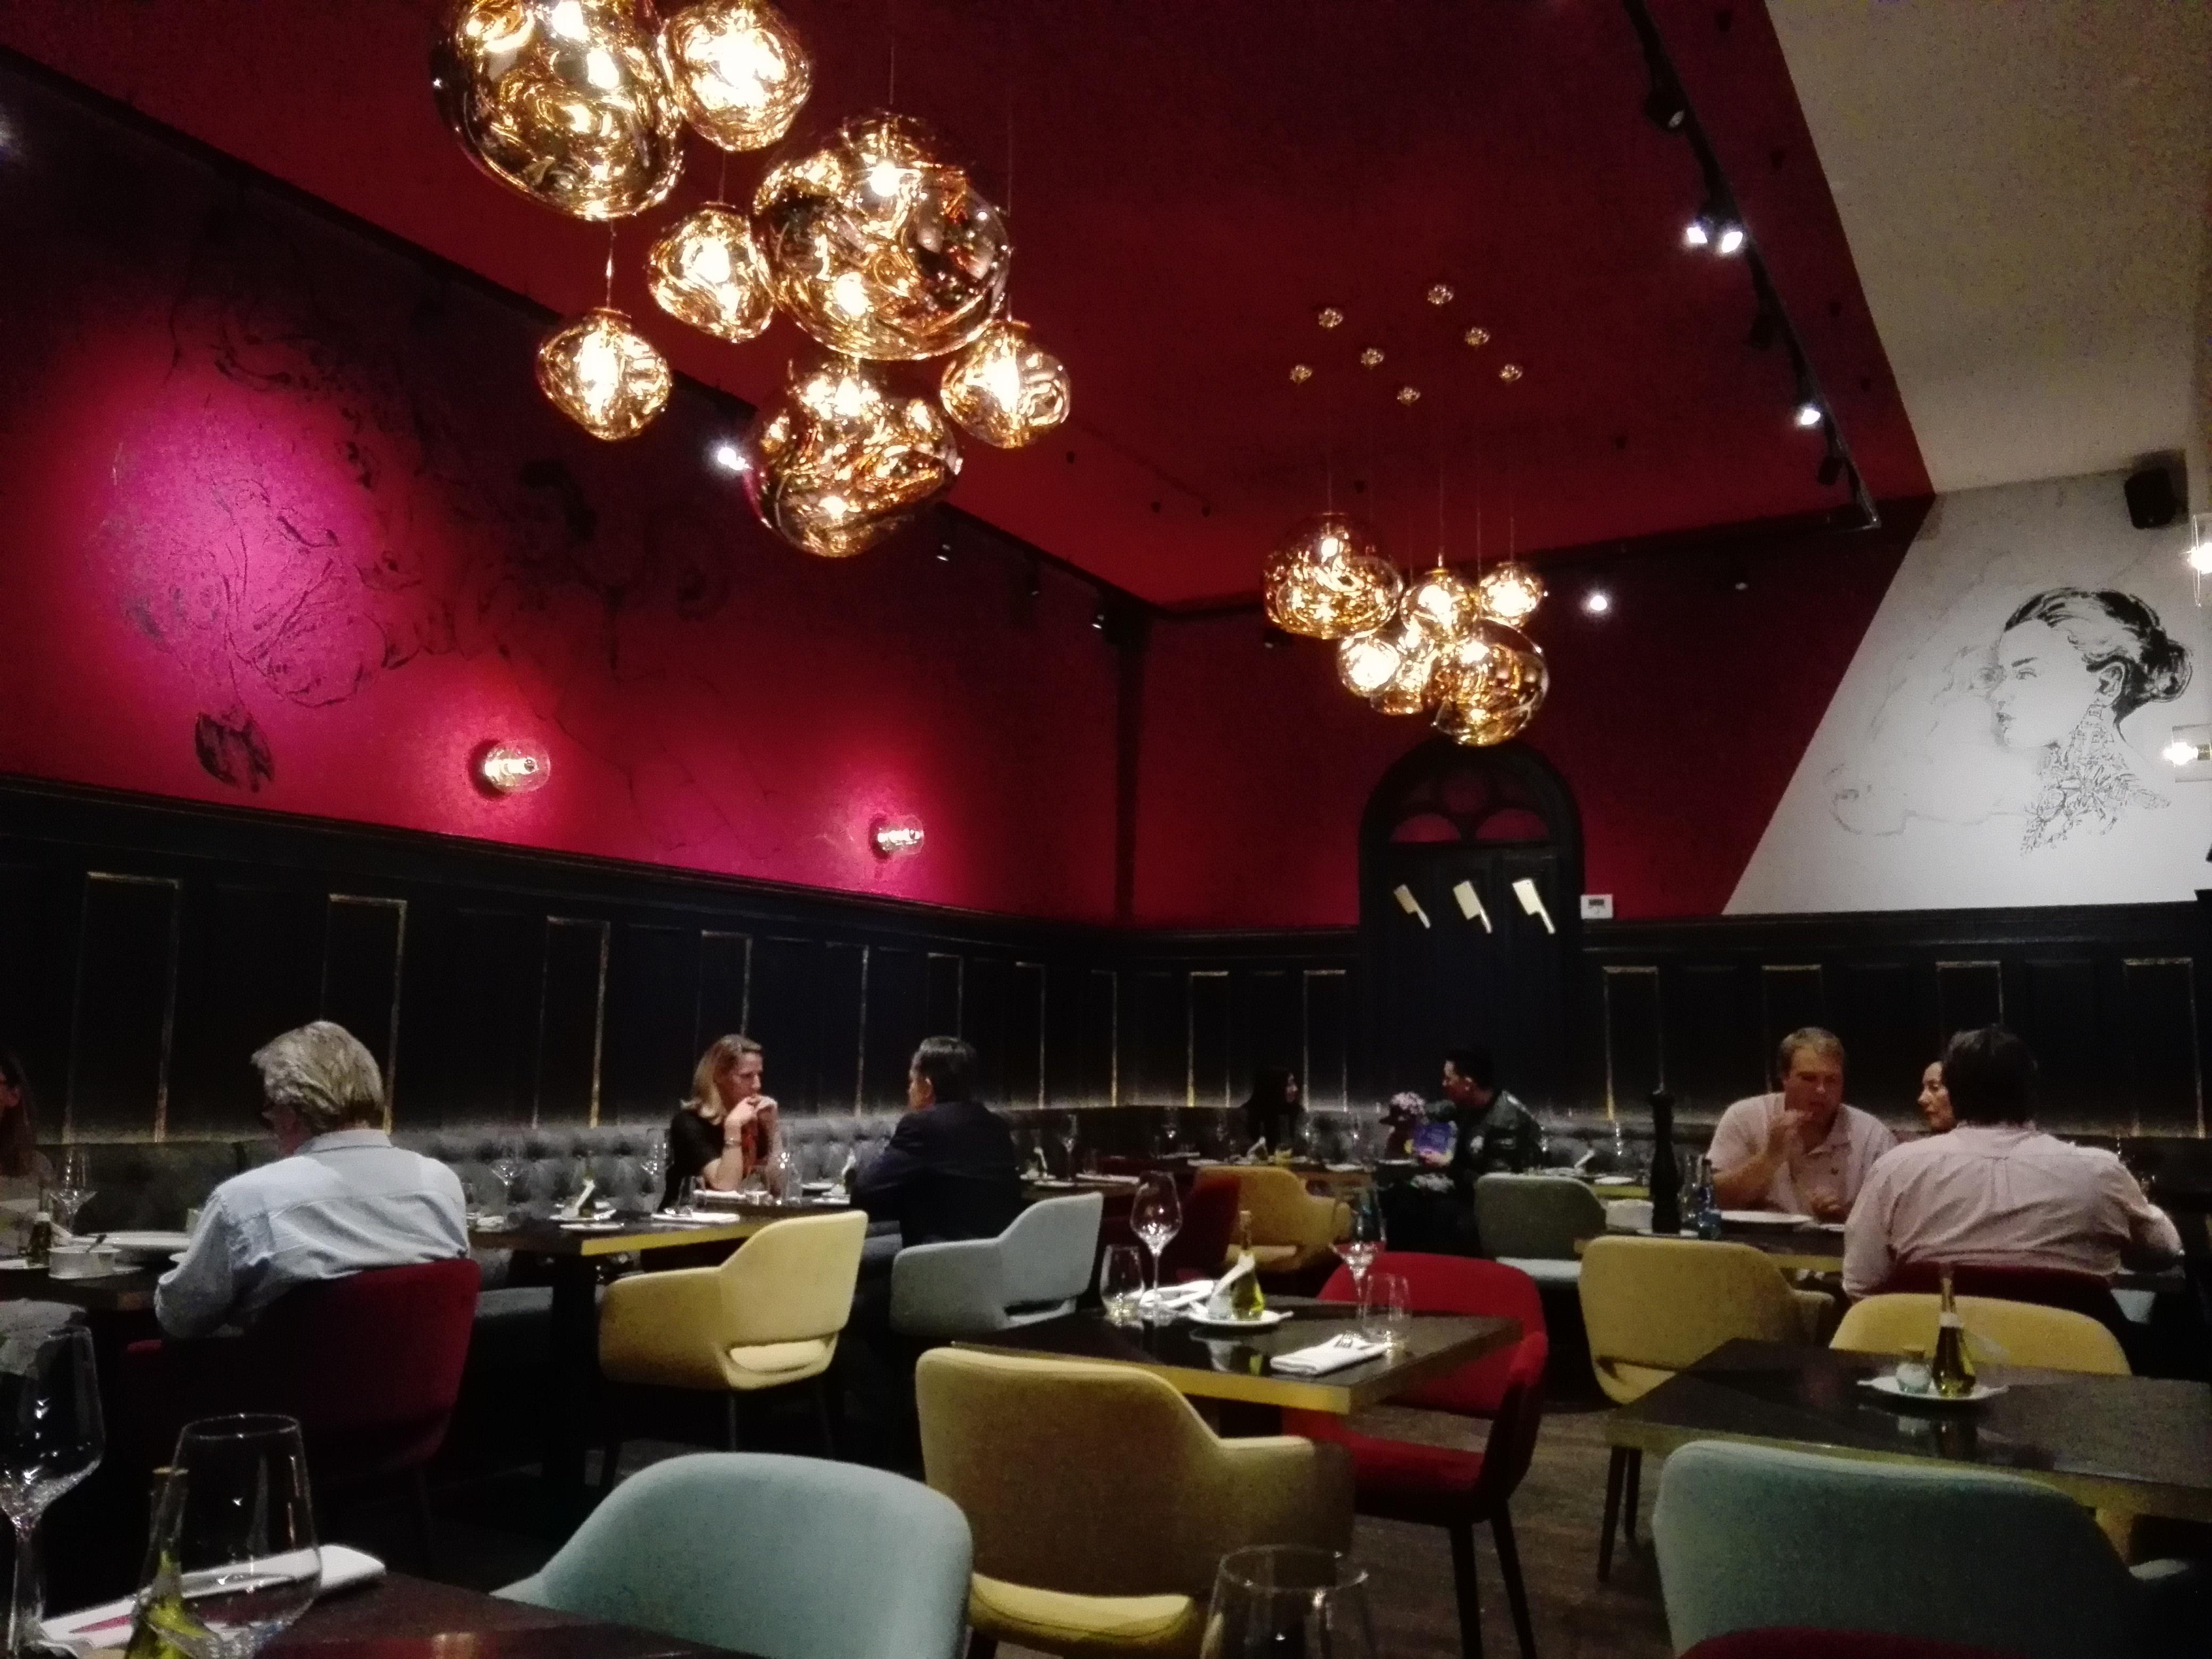 Steakrestaurant, Steakhouse Wien, Beef and Glory